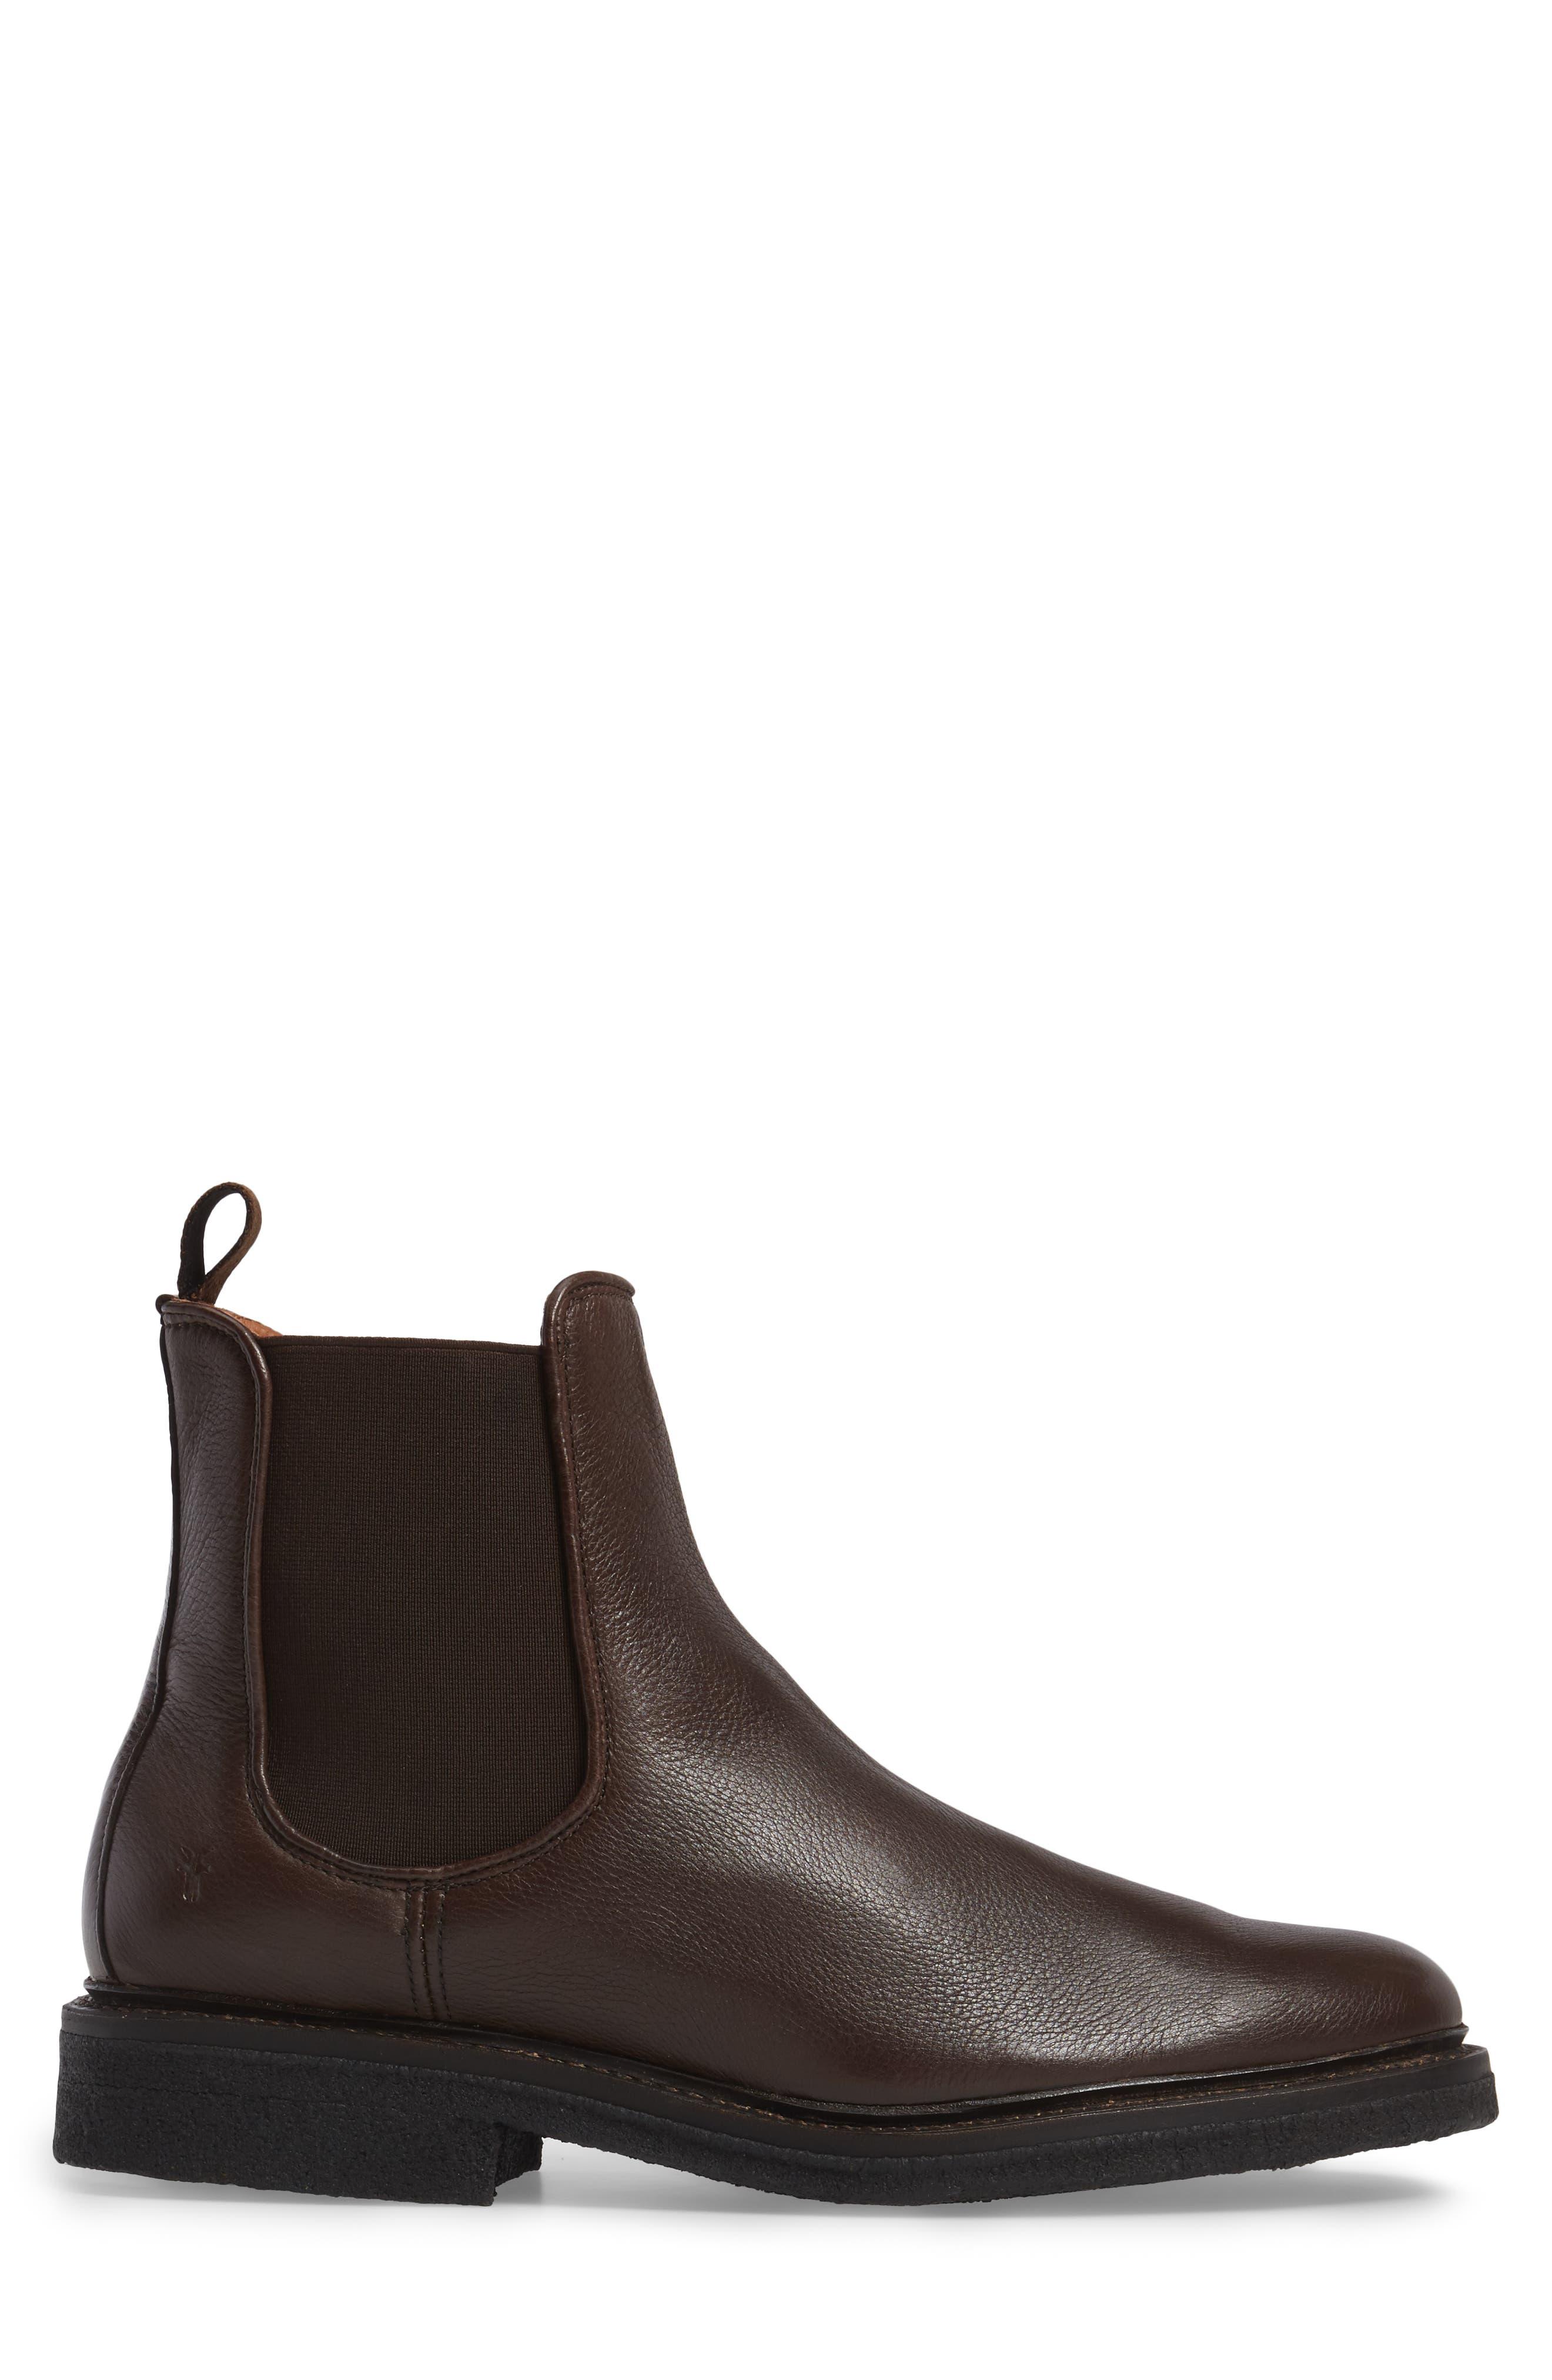 Country Chelsea Boot,                             Alternate thumbnail 3, color,                             Dark Brown